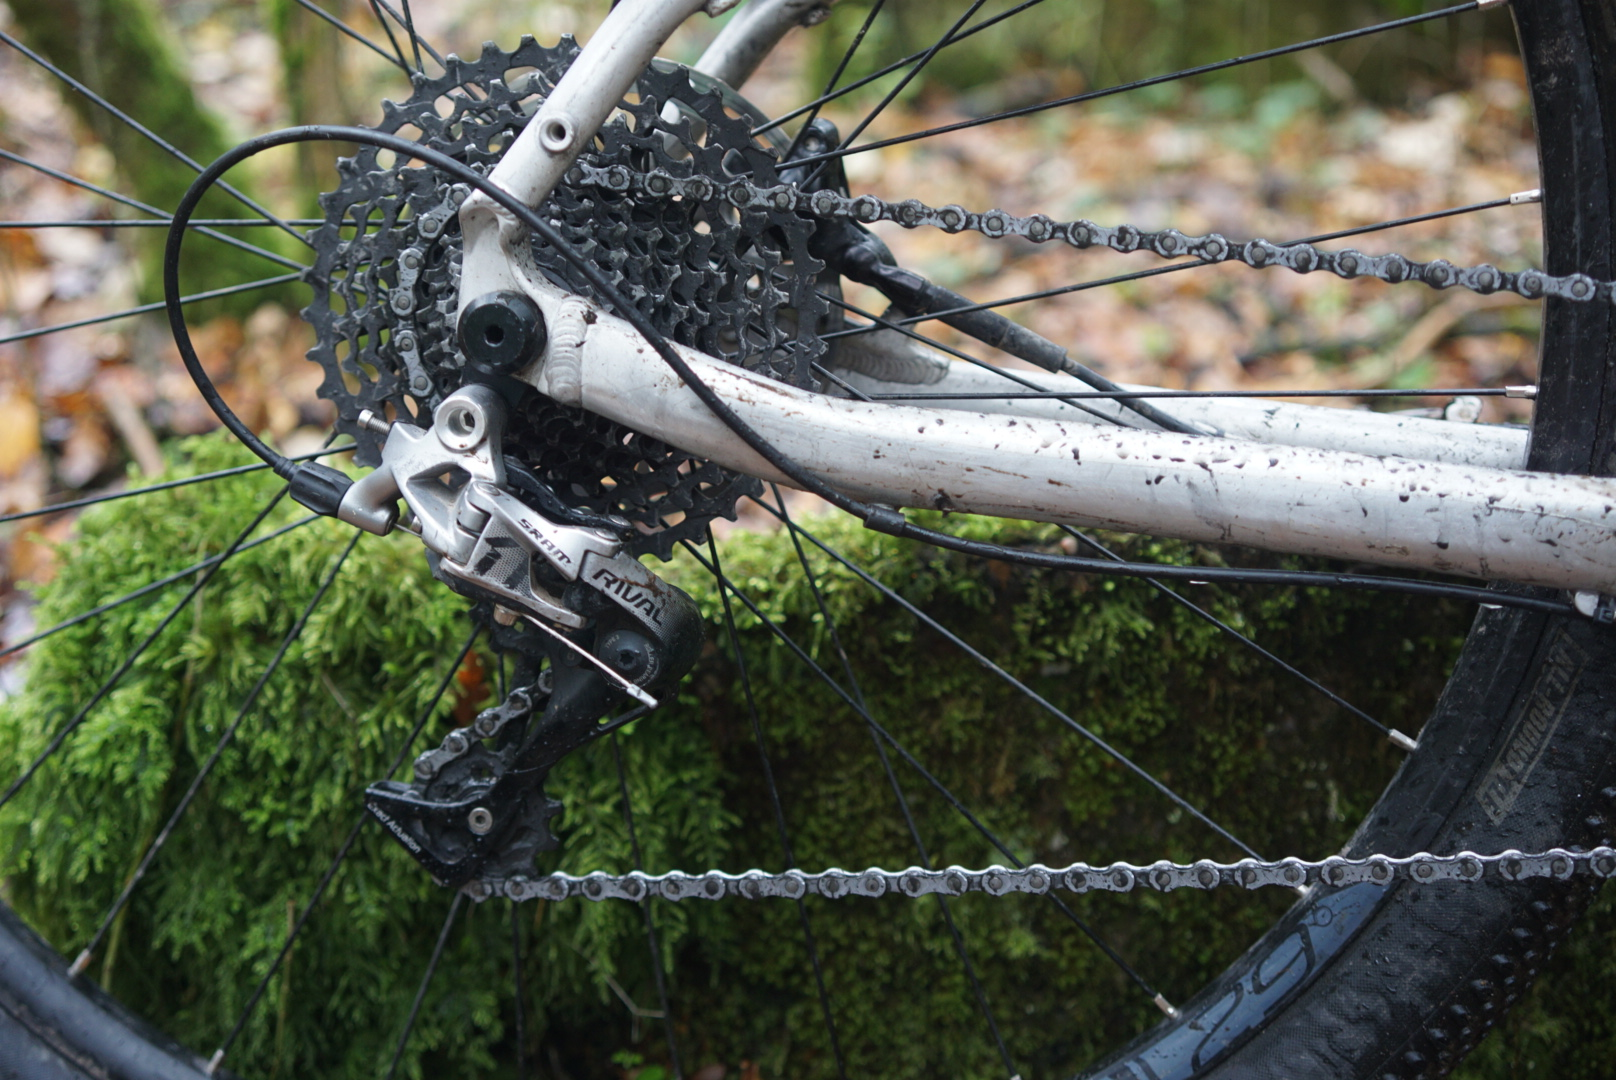 SRAM Rival Riverside 920 Touring Trekking Bikepacking Decathlon Cheap Budget